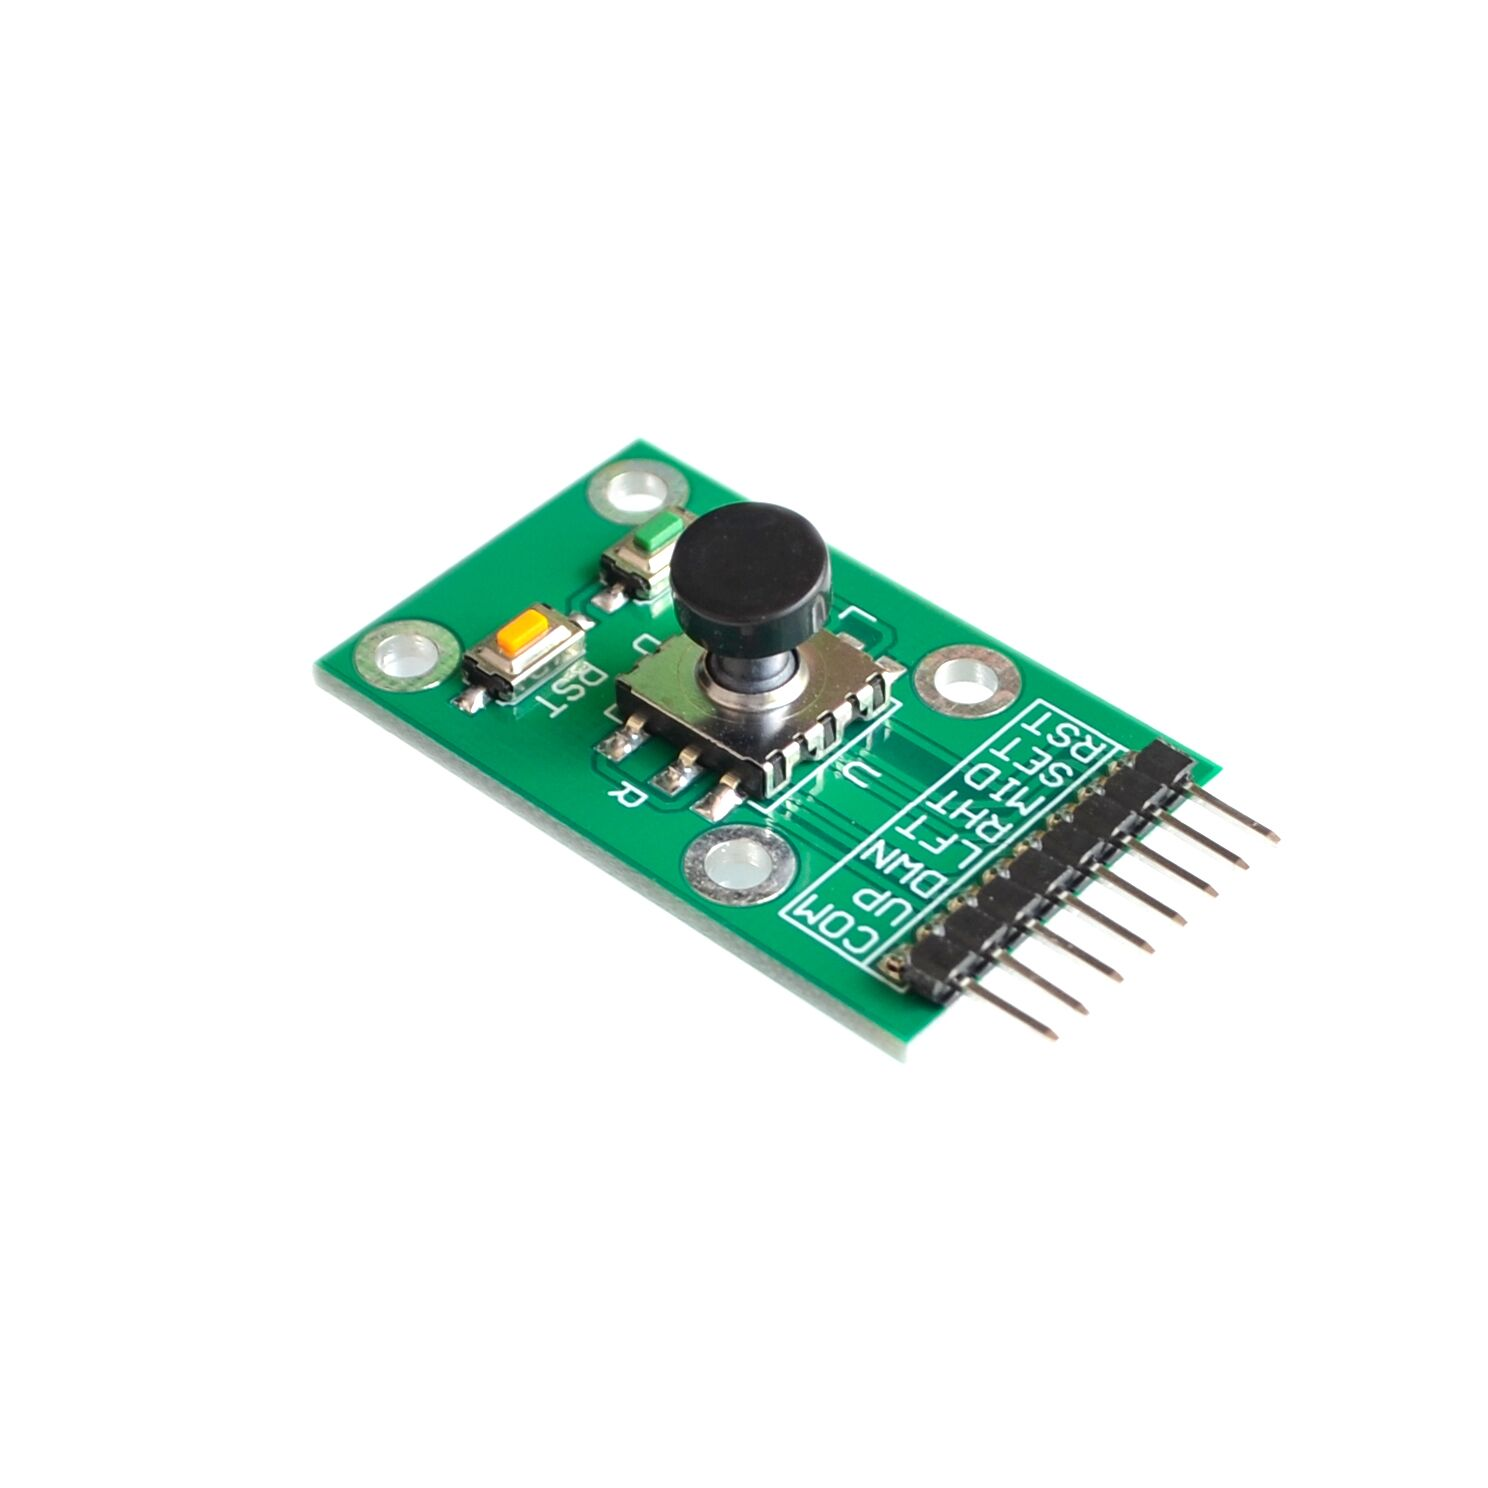 2PSC 5 Direction Key Tastatur Modul Mikrocontroller Board Navigation Button